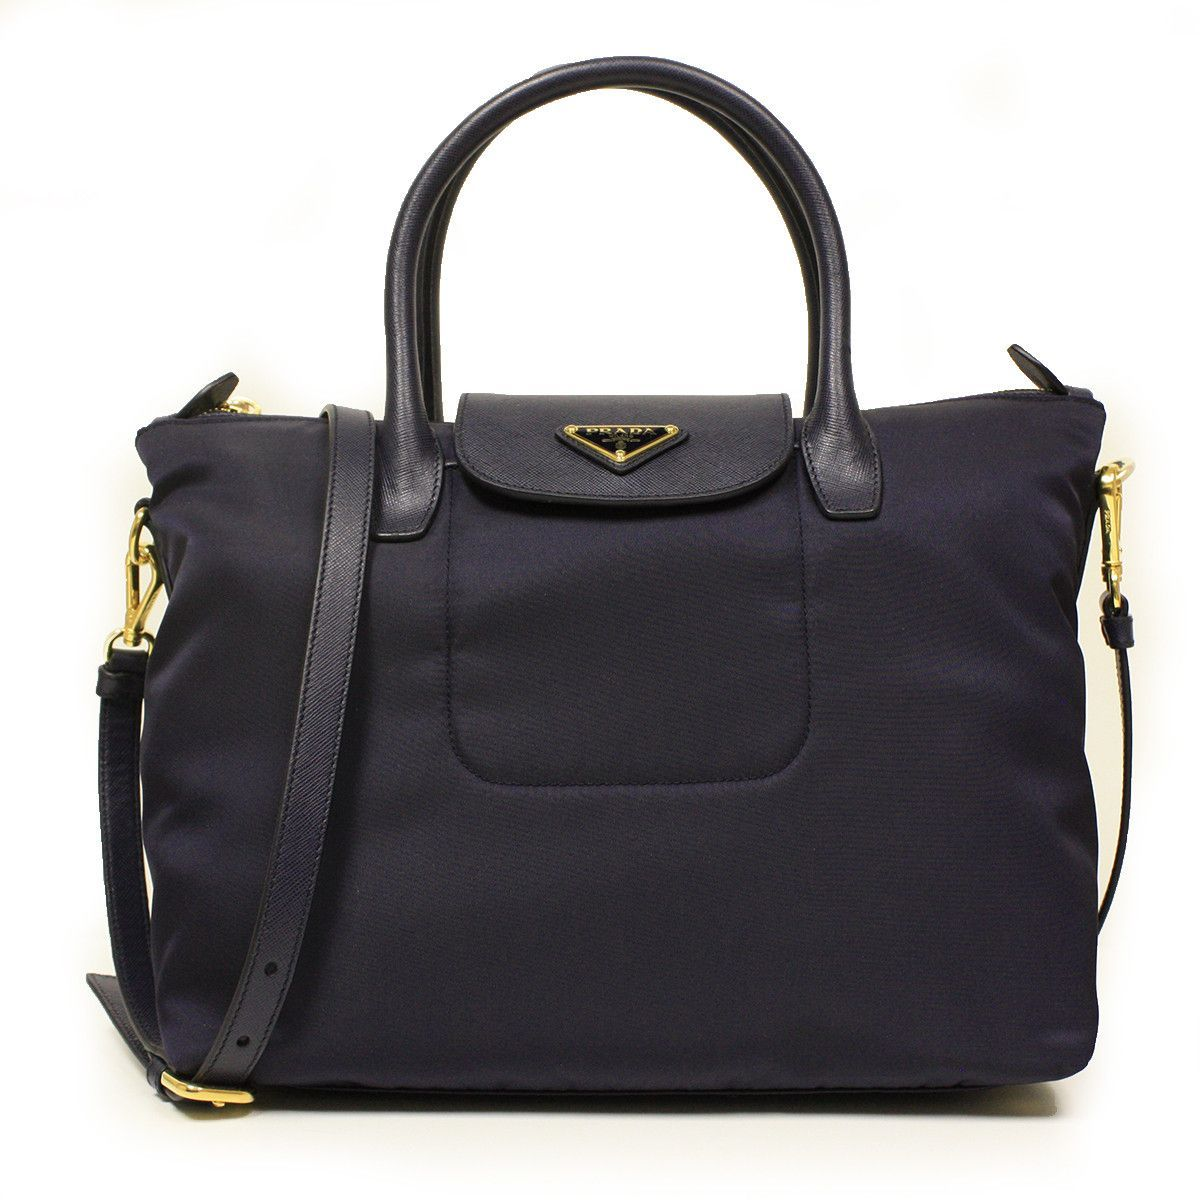 e3d405078284 Prada Bleu Tessuto Saffian Navy Blue Nylon and Leather Shopping Tote ...